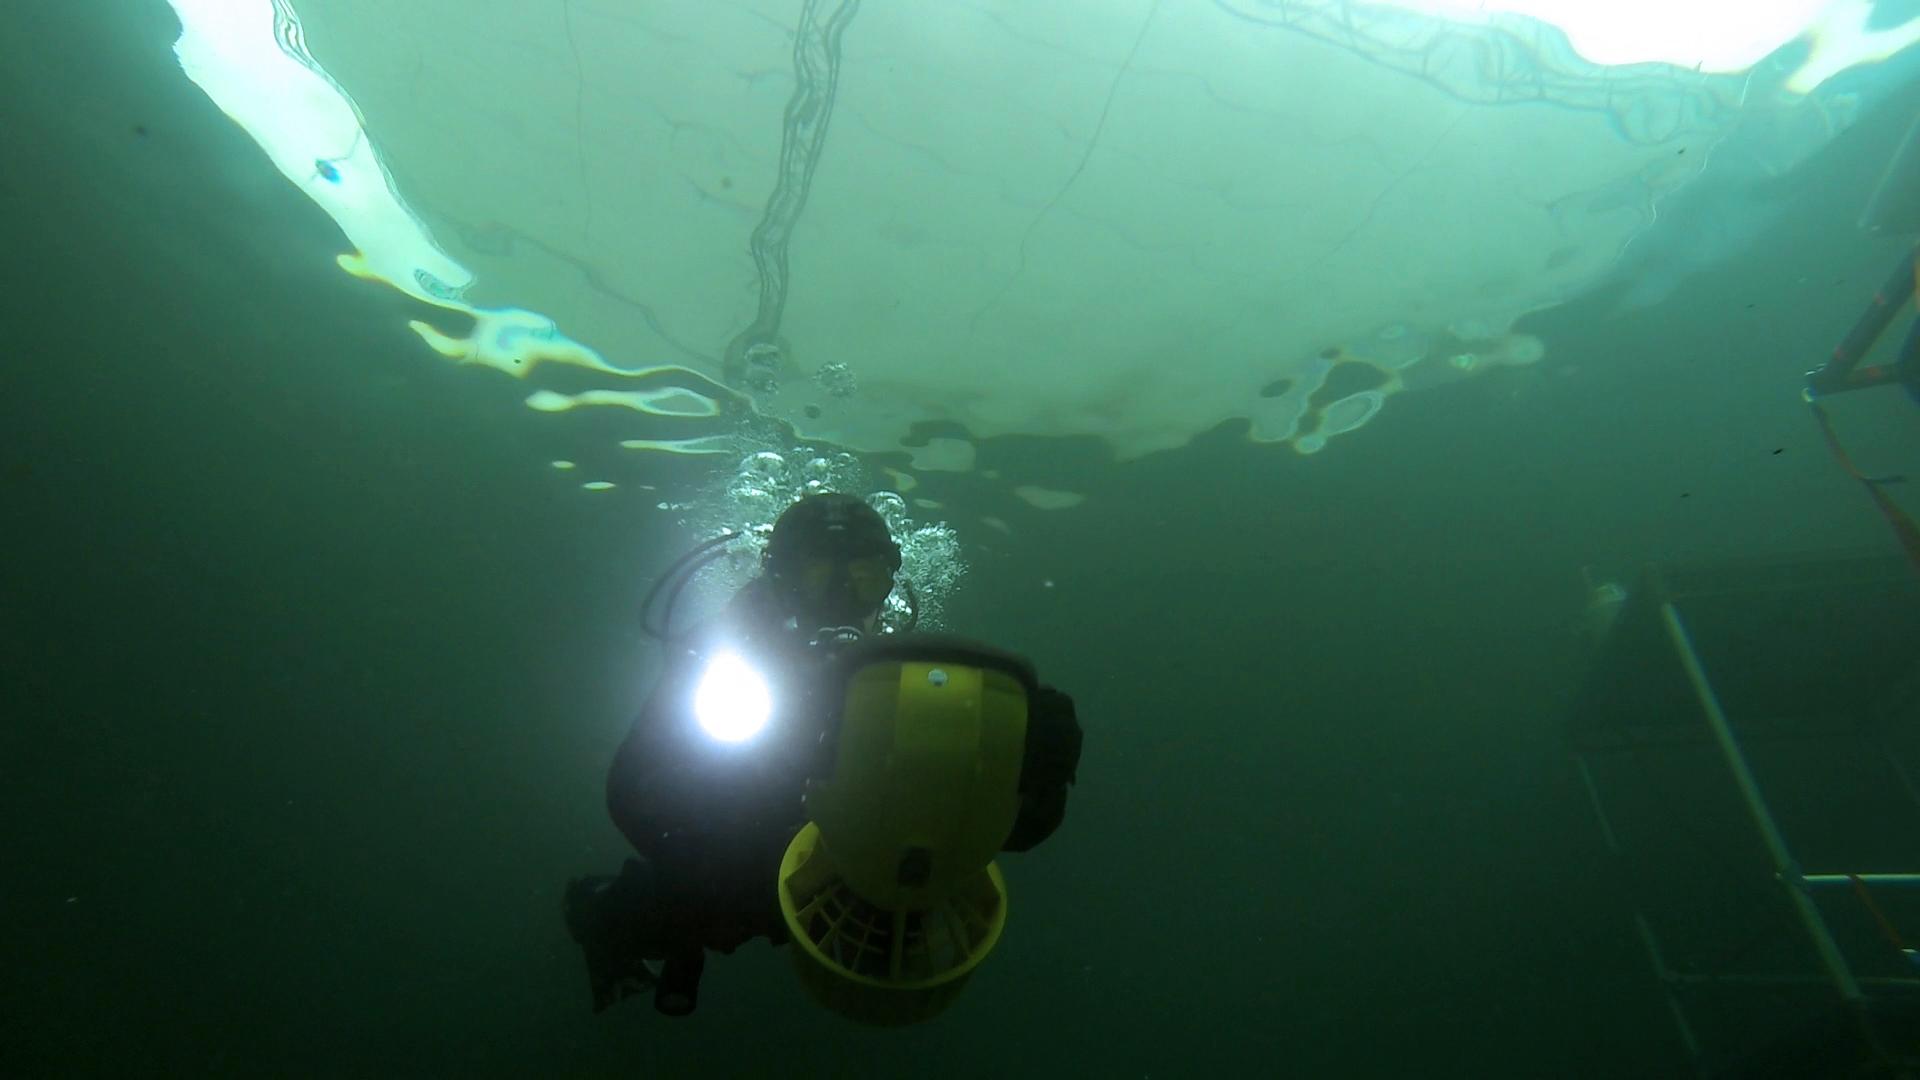 MG Action, Martin Goeres, Performing, Tauchen, Diving